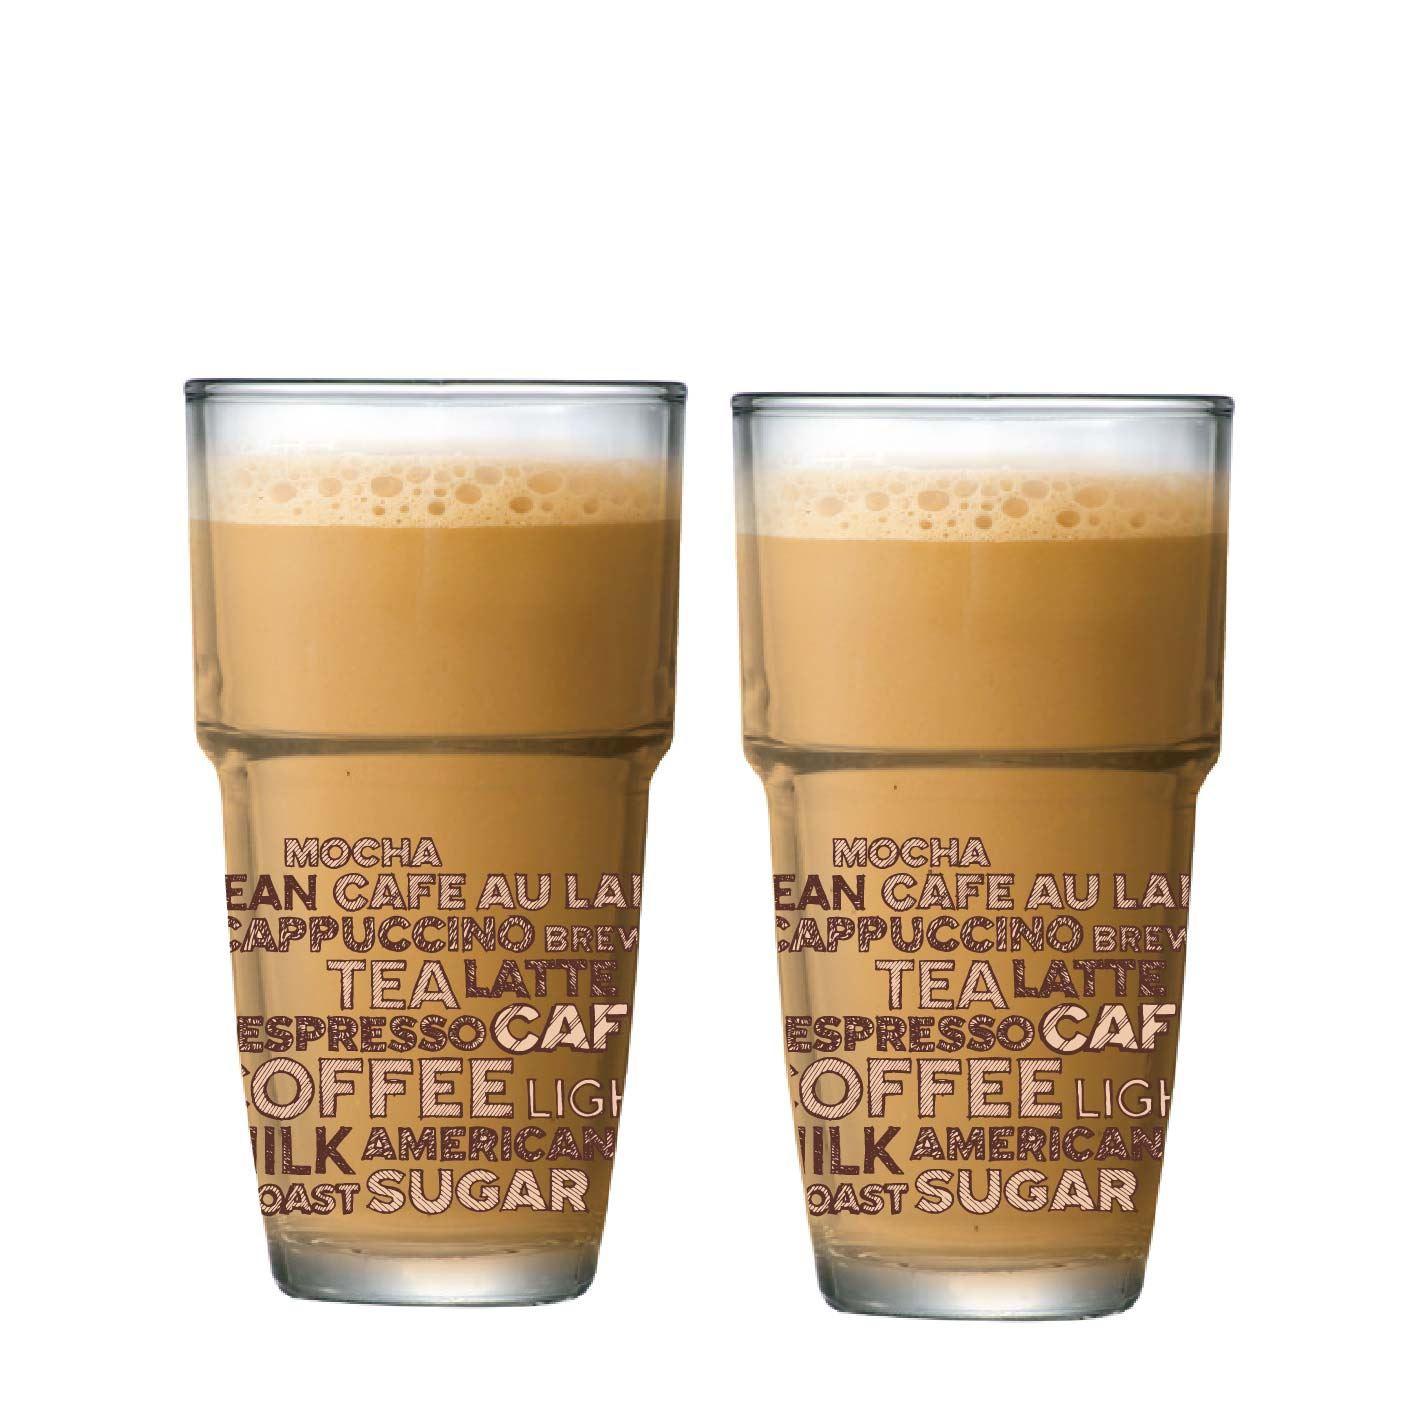 Jogo de Copos de Café Empilhavel Styles Luva 2 Pcs 360ml